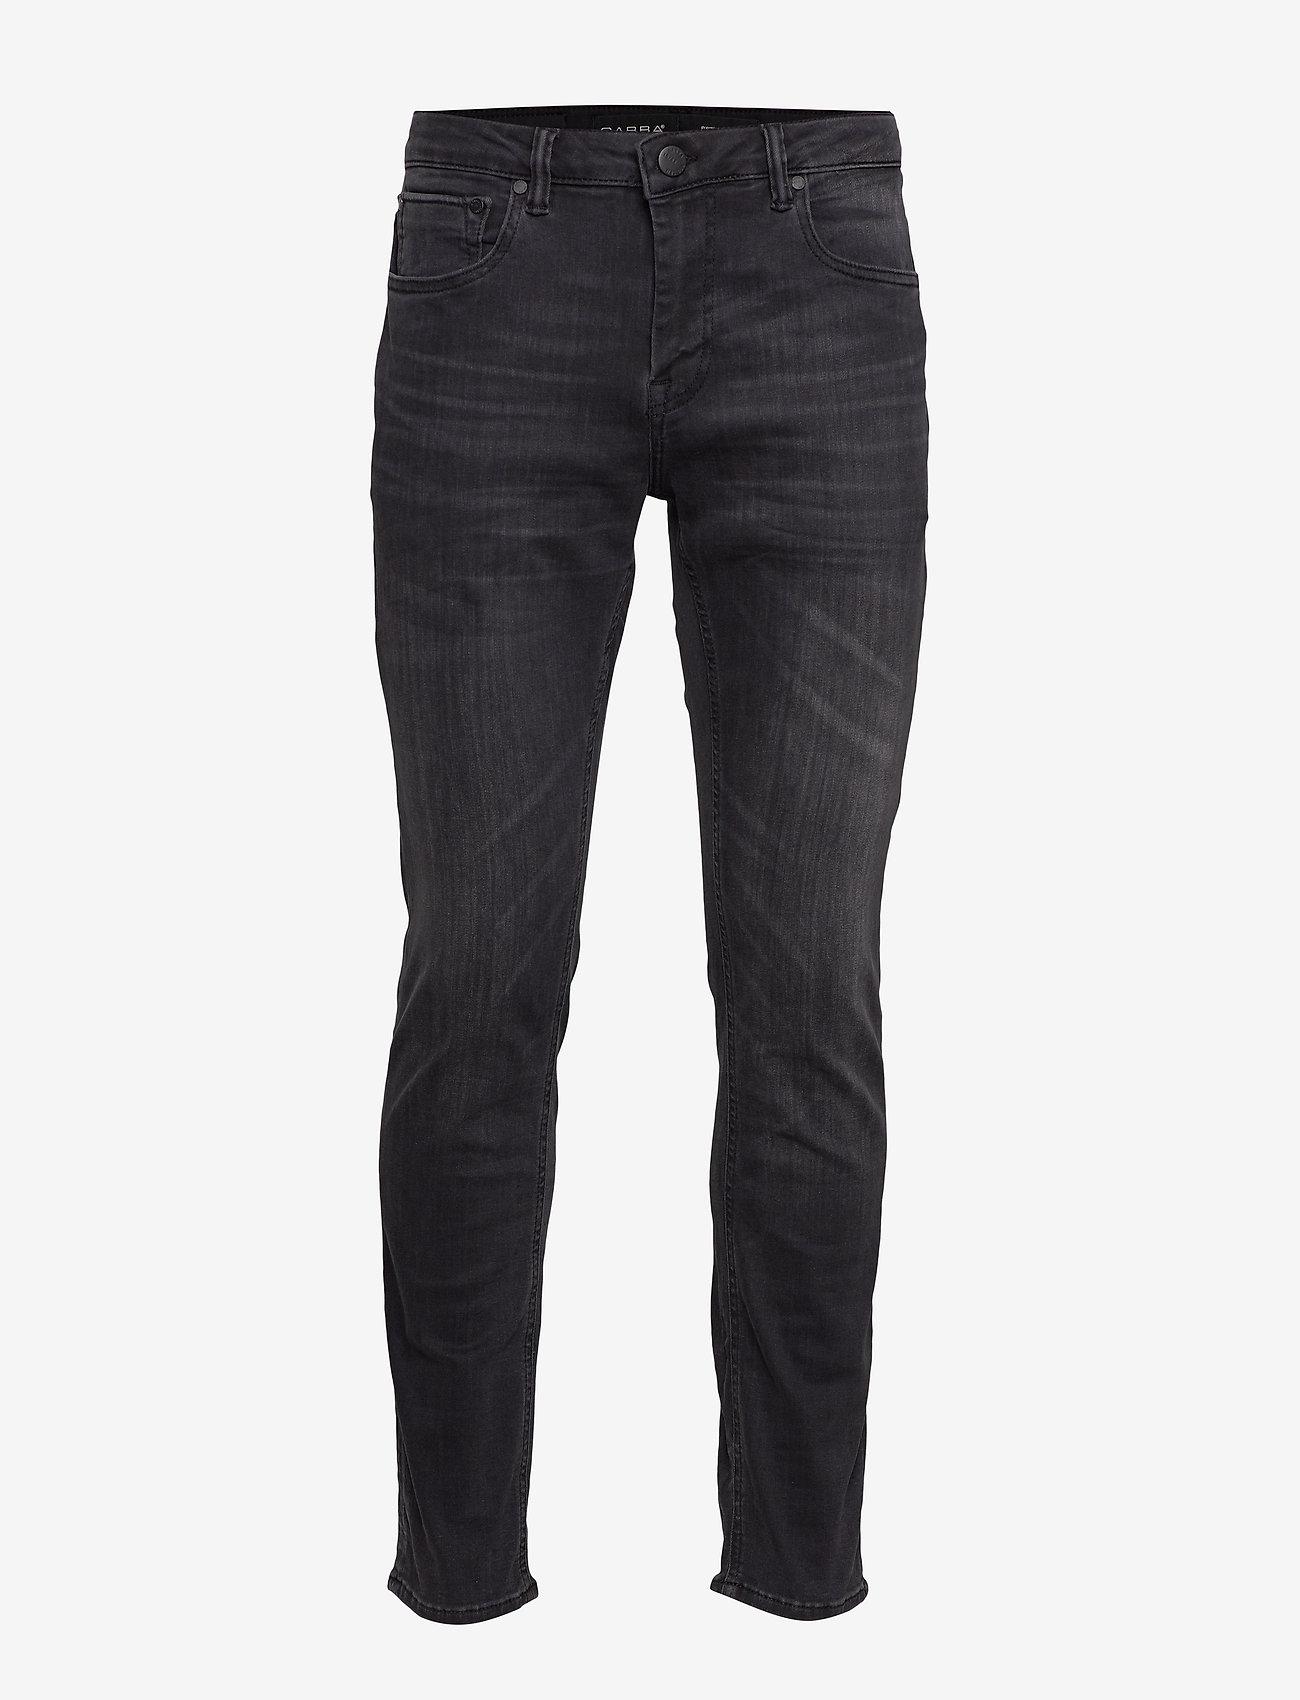 Gabba - Jones K3459 Jeans - slim jeans - rs1259 - 0